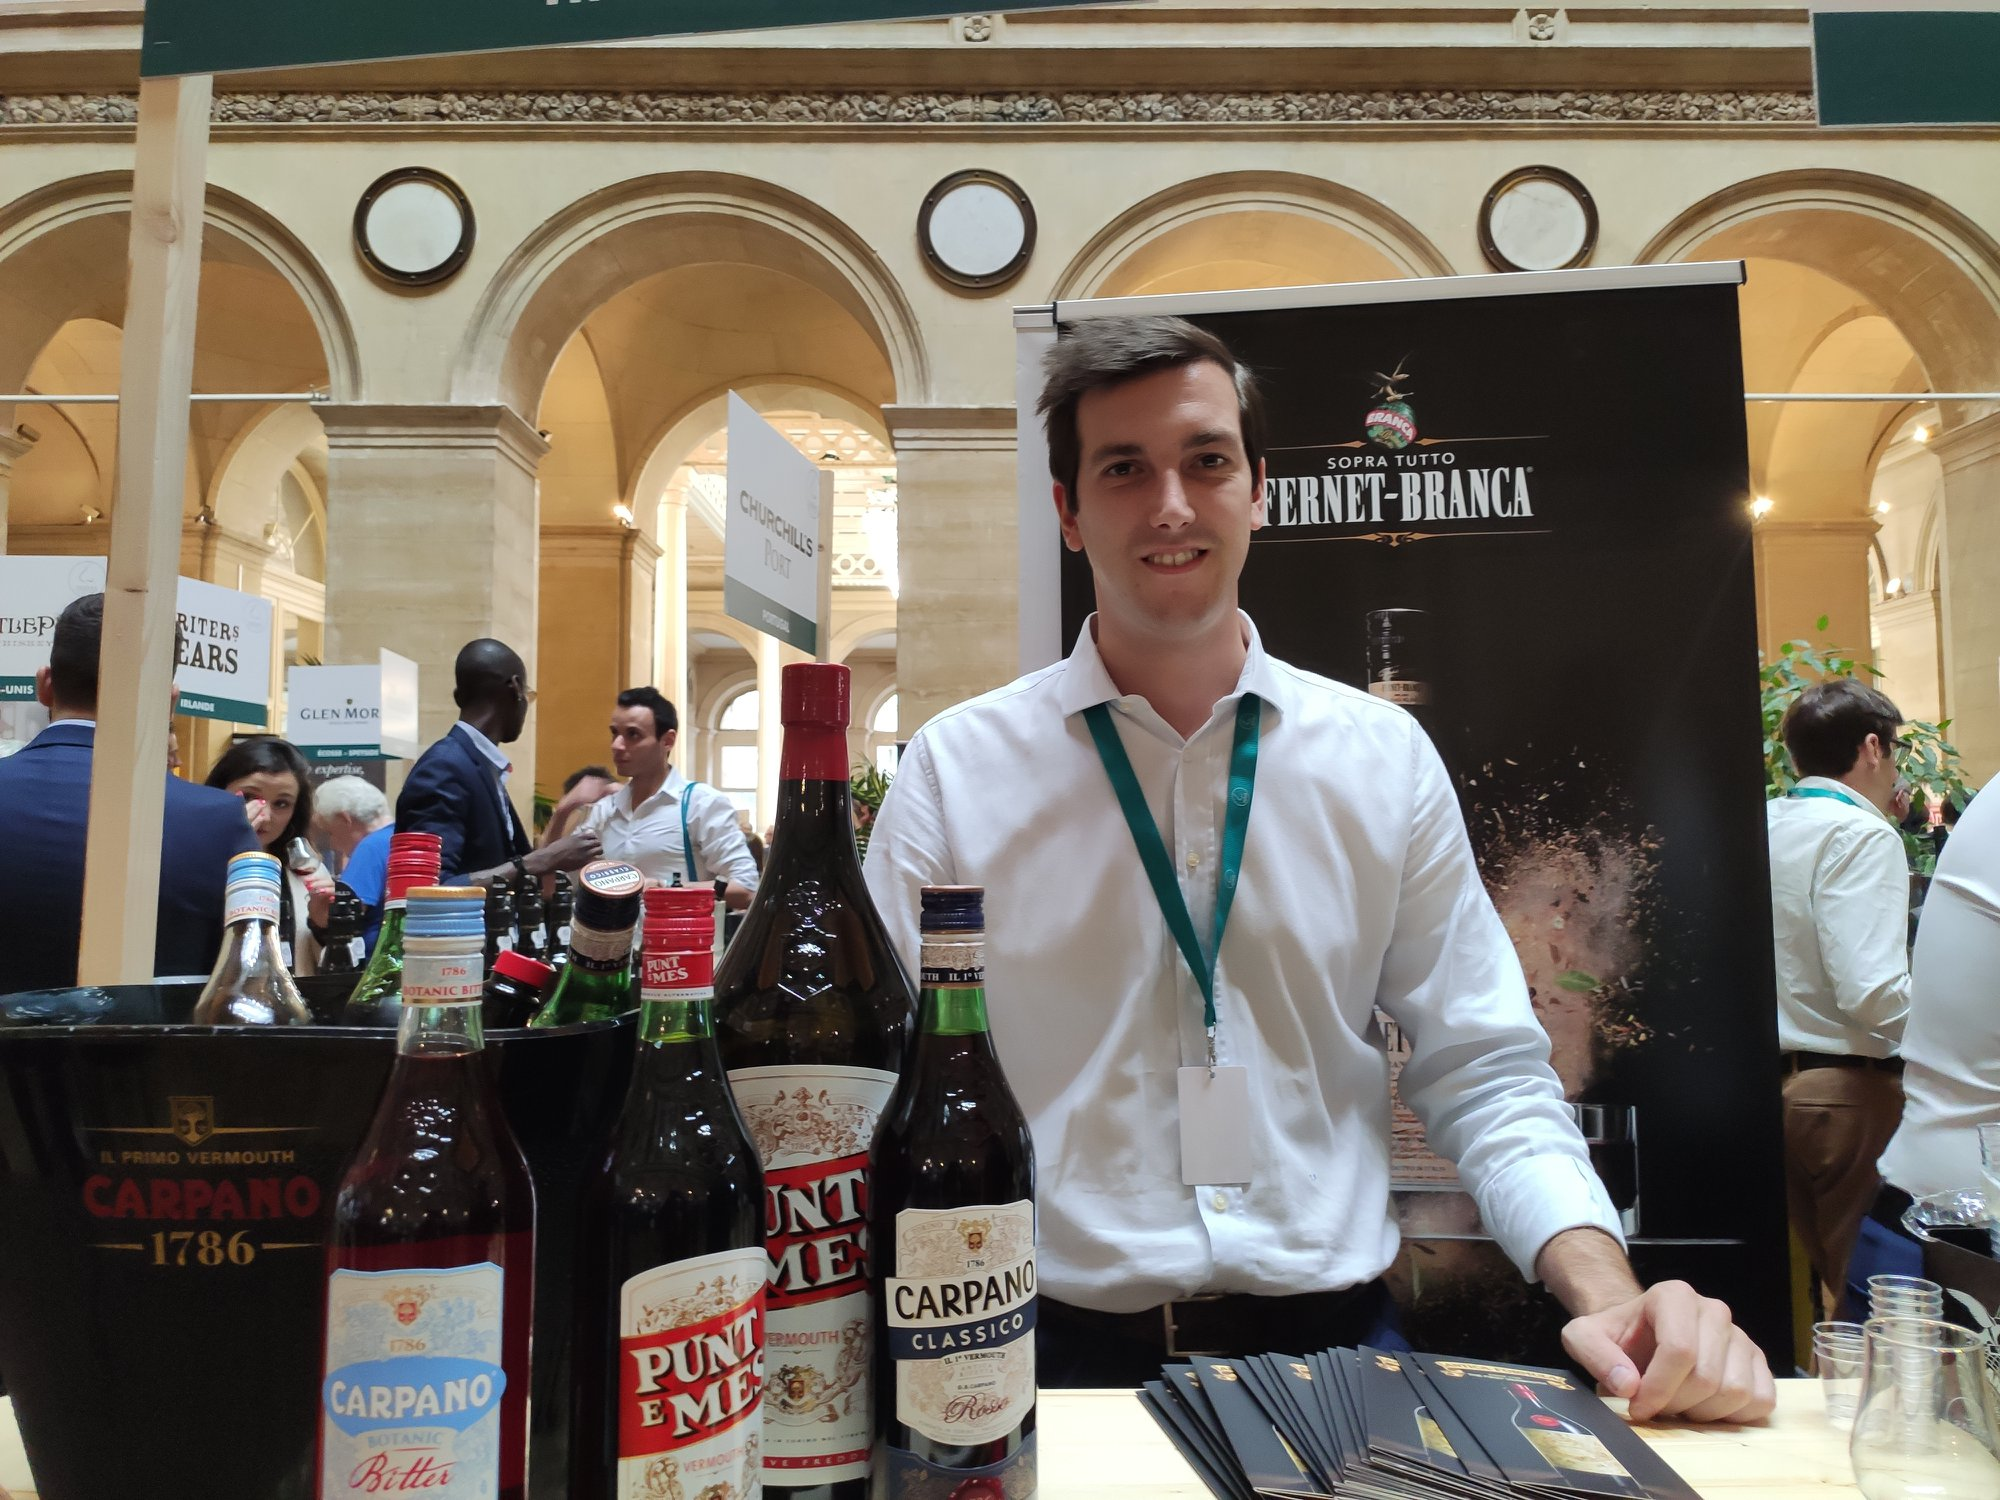 Tommaso Severi - Fernet-Branca